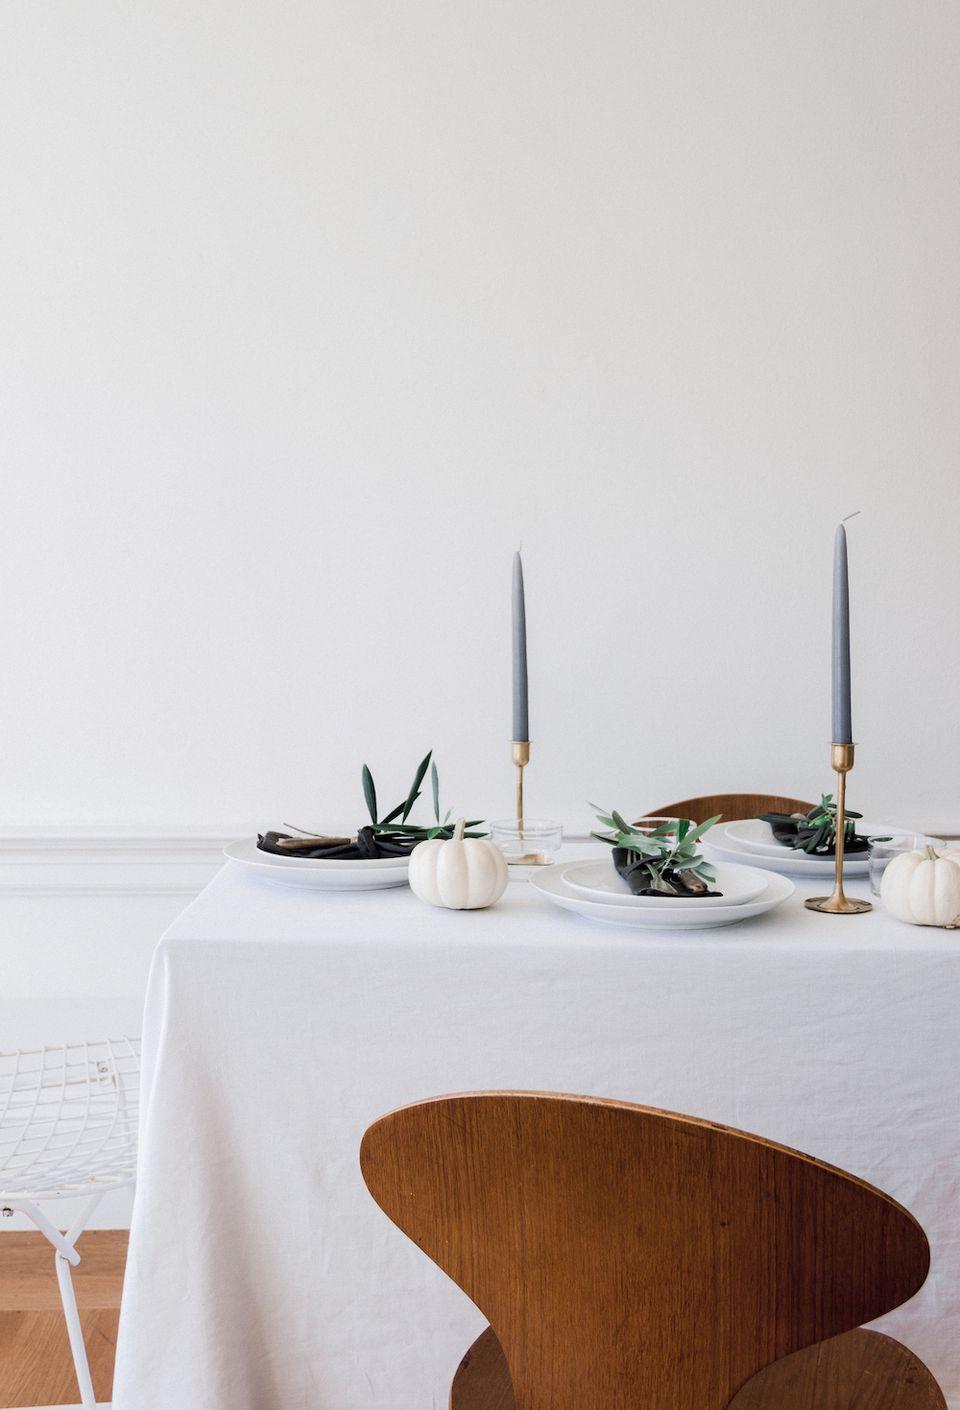 Minimalist fall table decor.